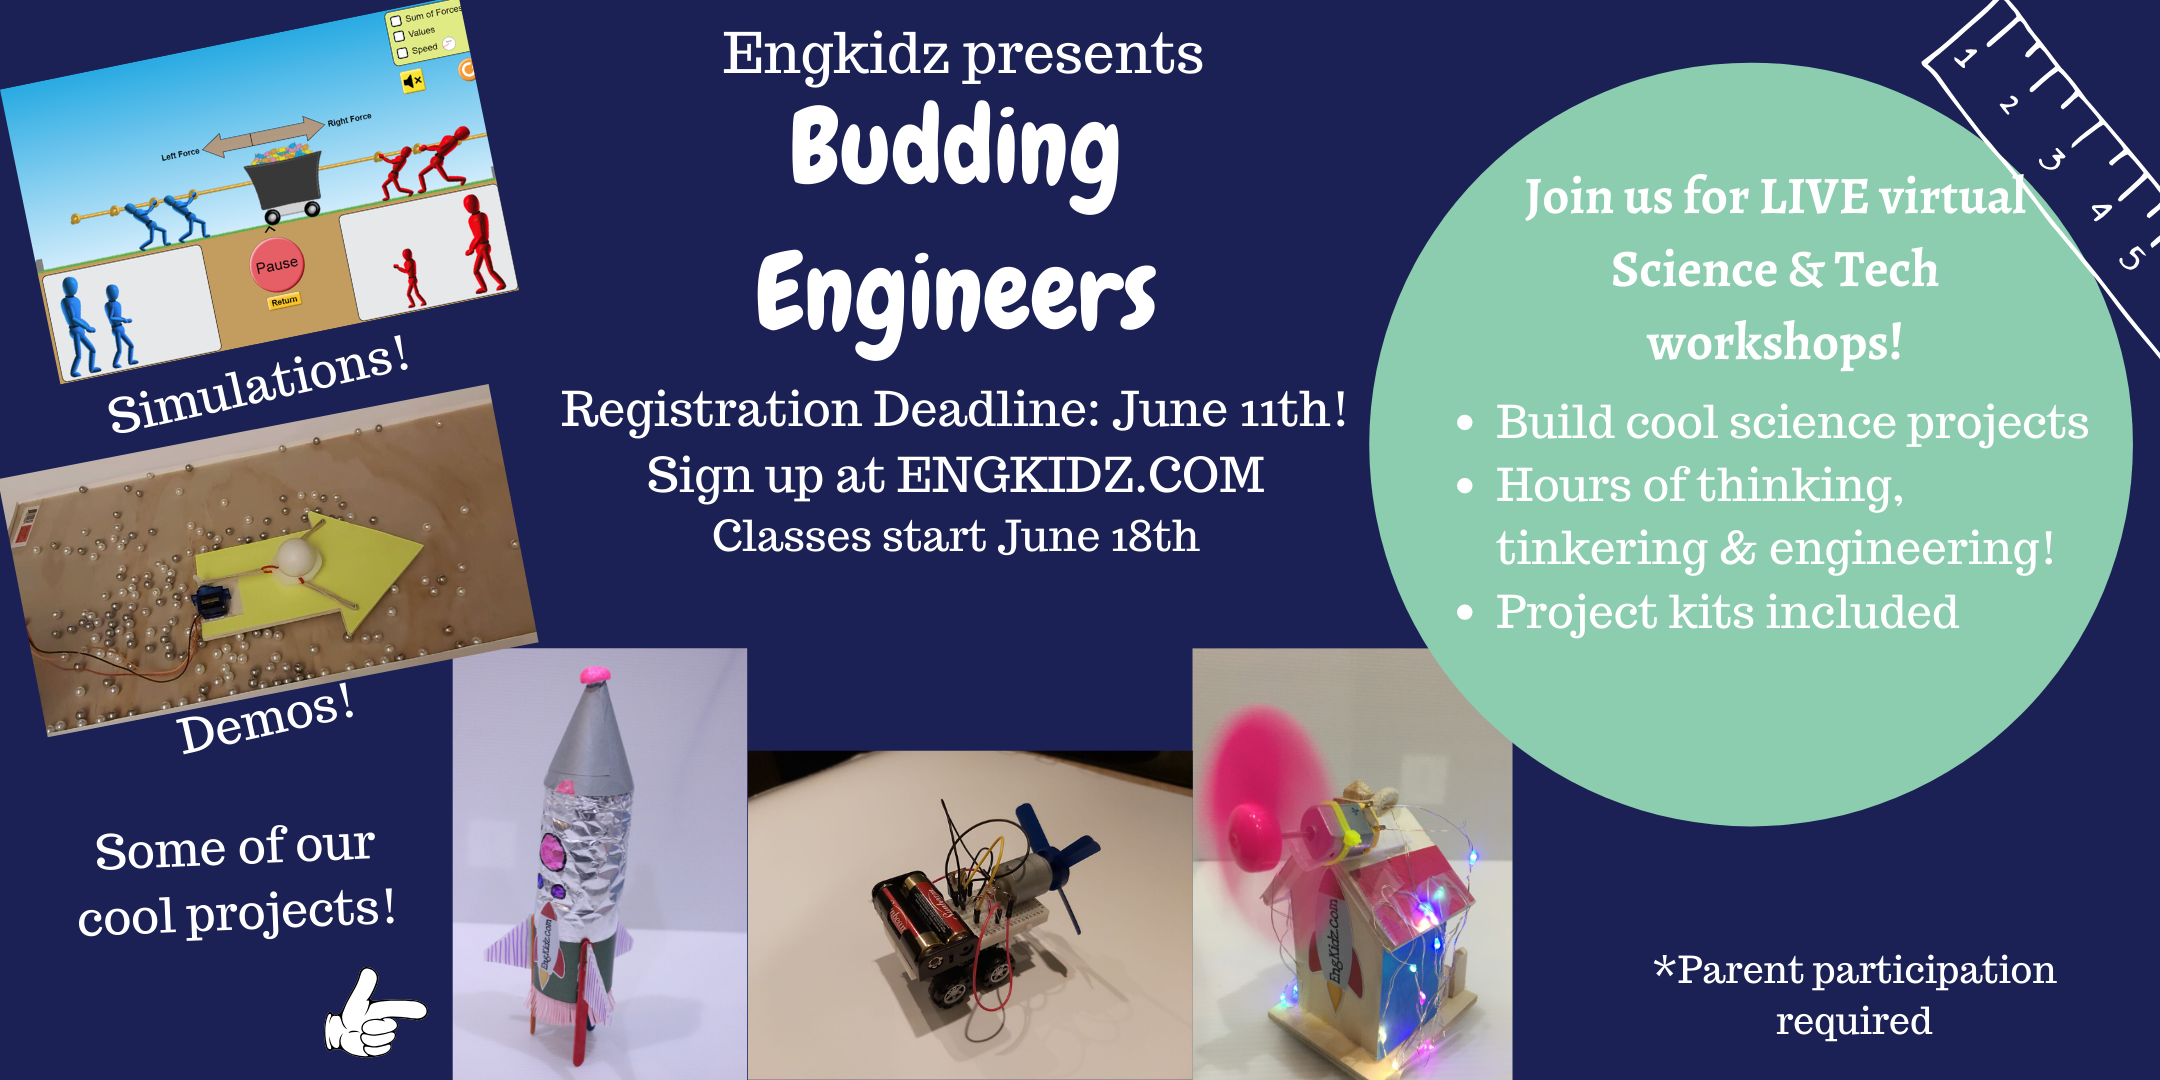 Engkidz - LIVE - Online Science Workshops for Kids - Hands-on Projects